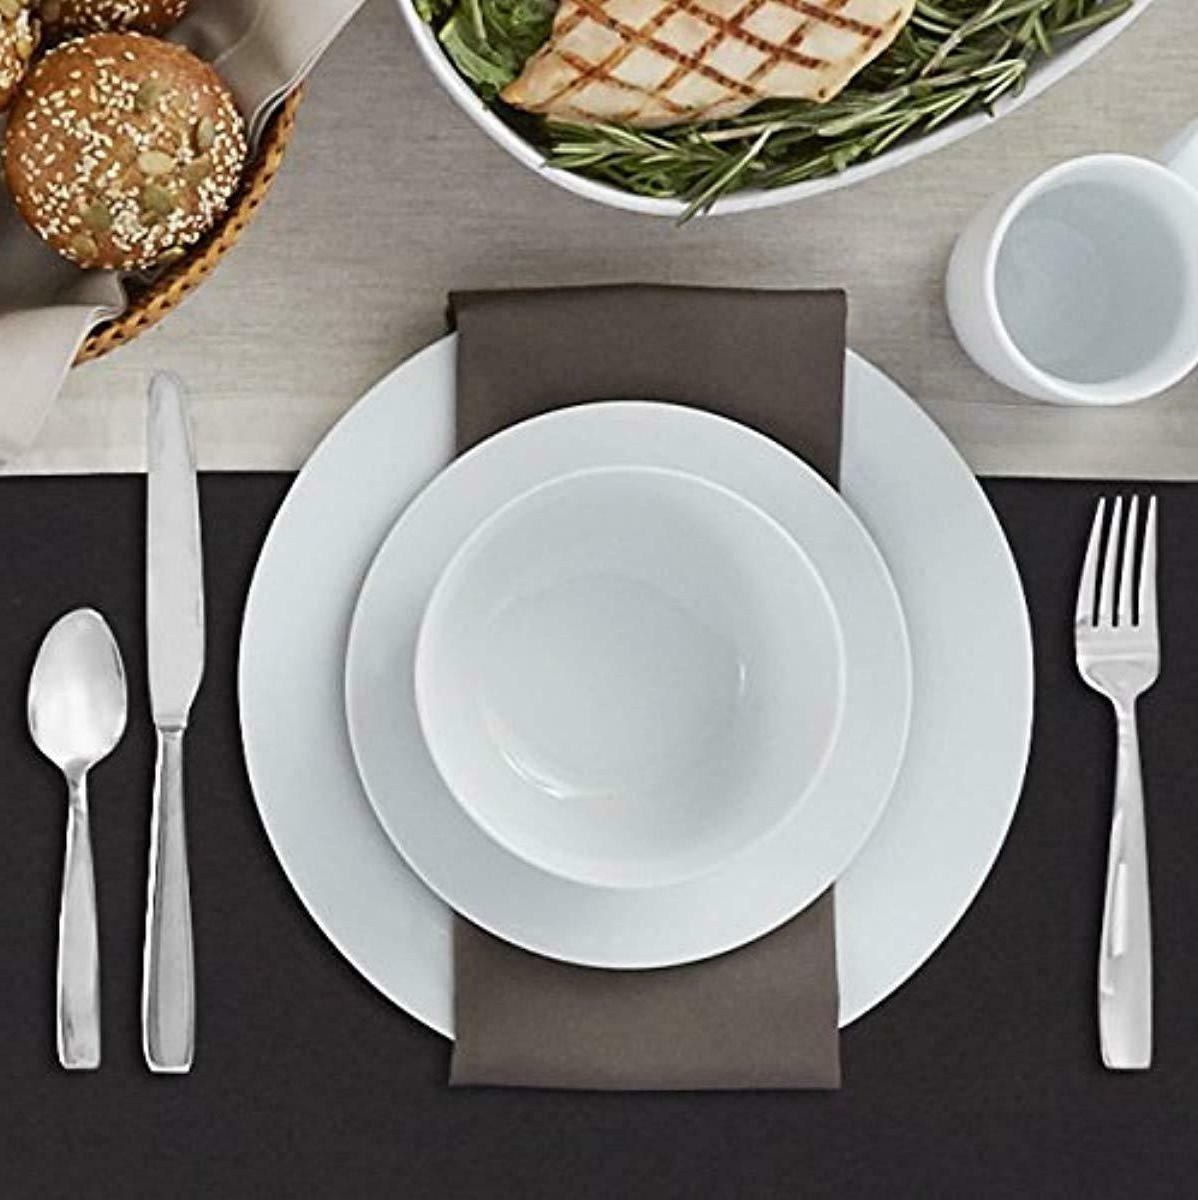 AmazonBasics Set, Plates, Bowls, Service 4